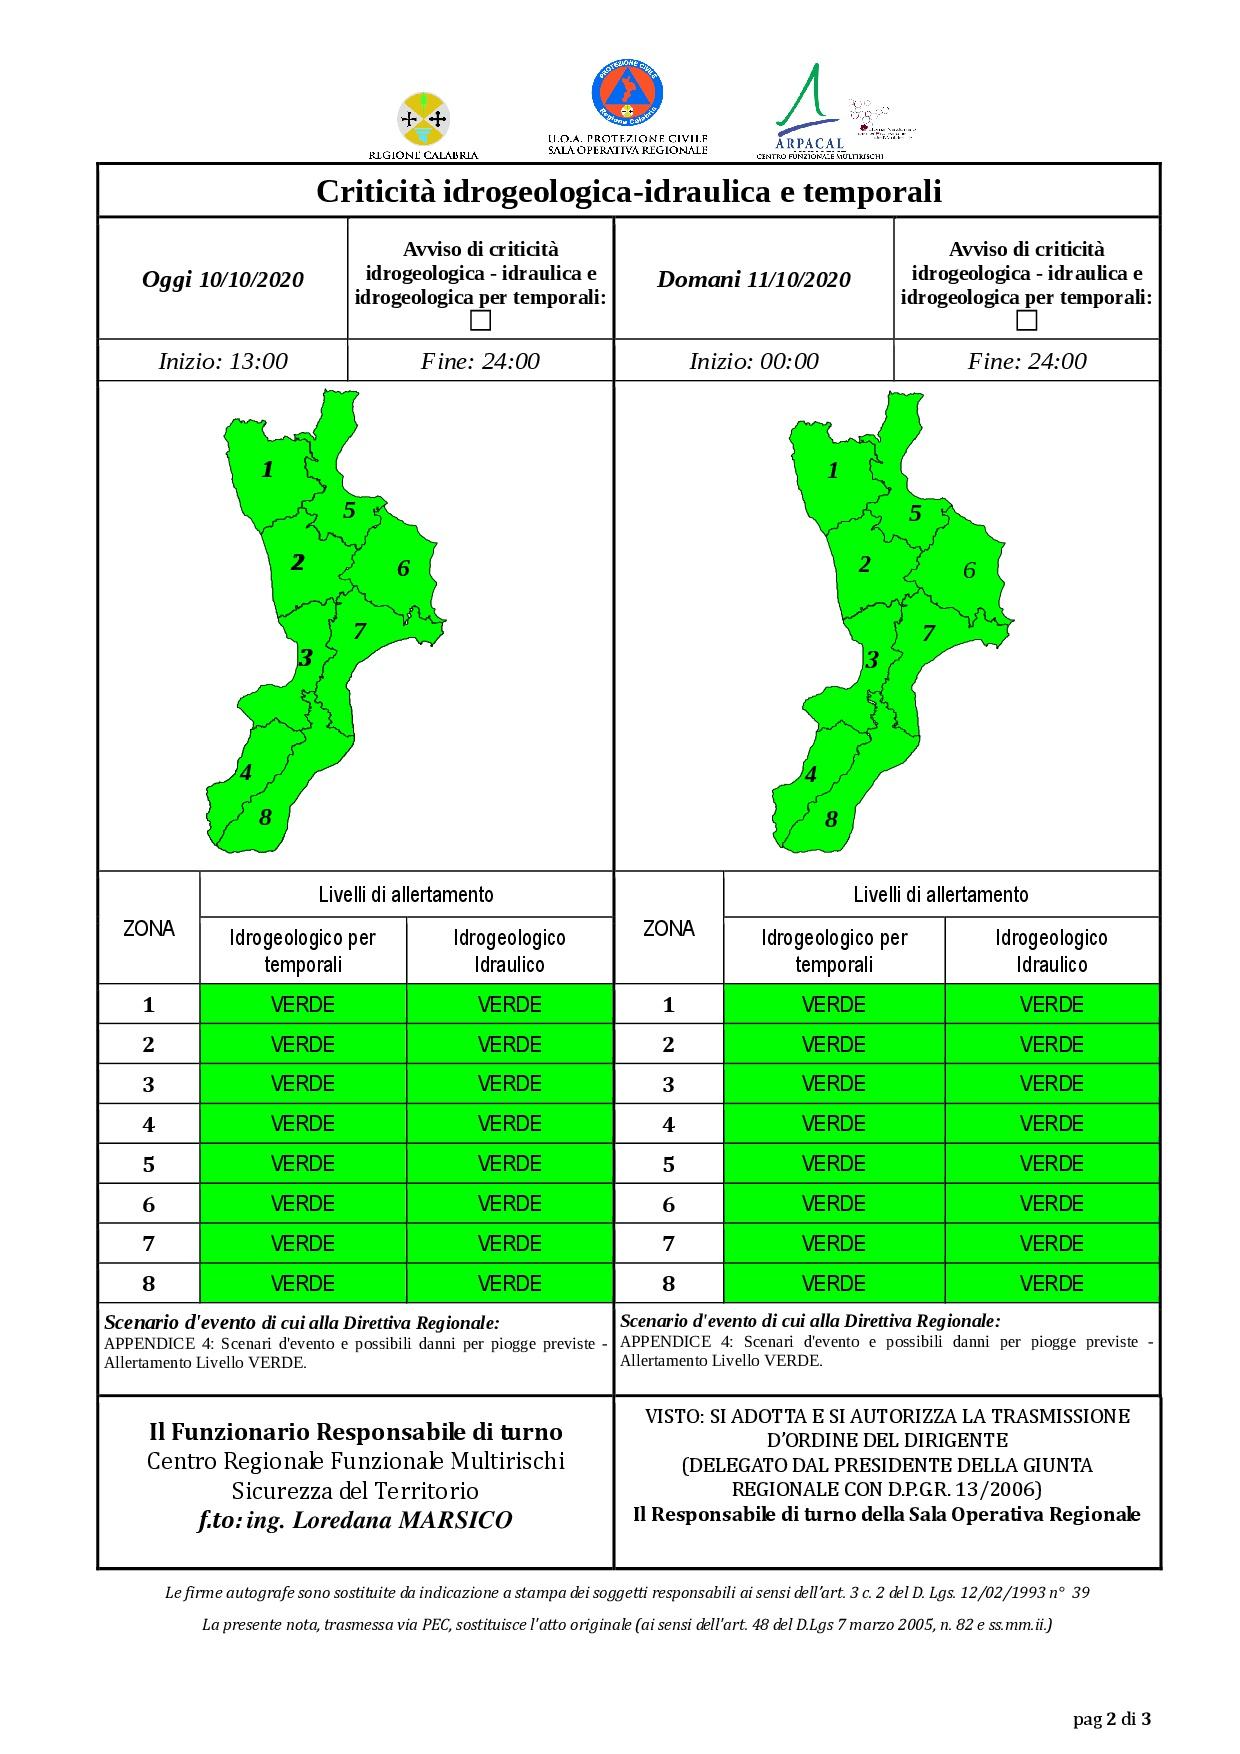 Criticità idrogeologica-idraulica e temporali in Calabria 10-10-2020